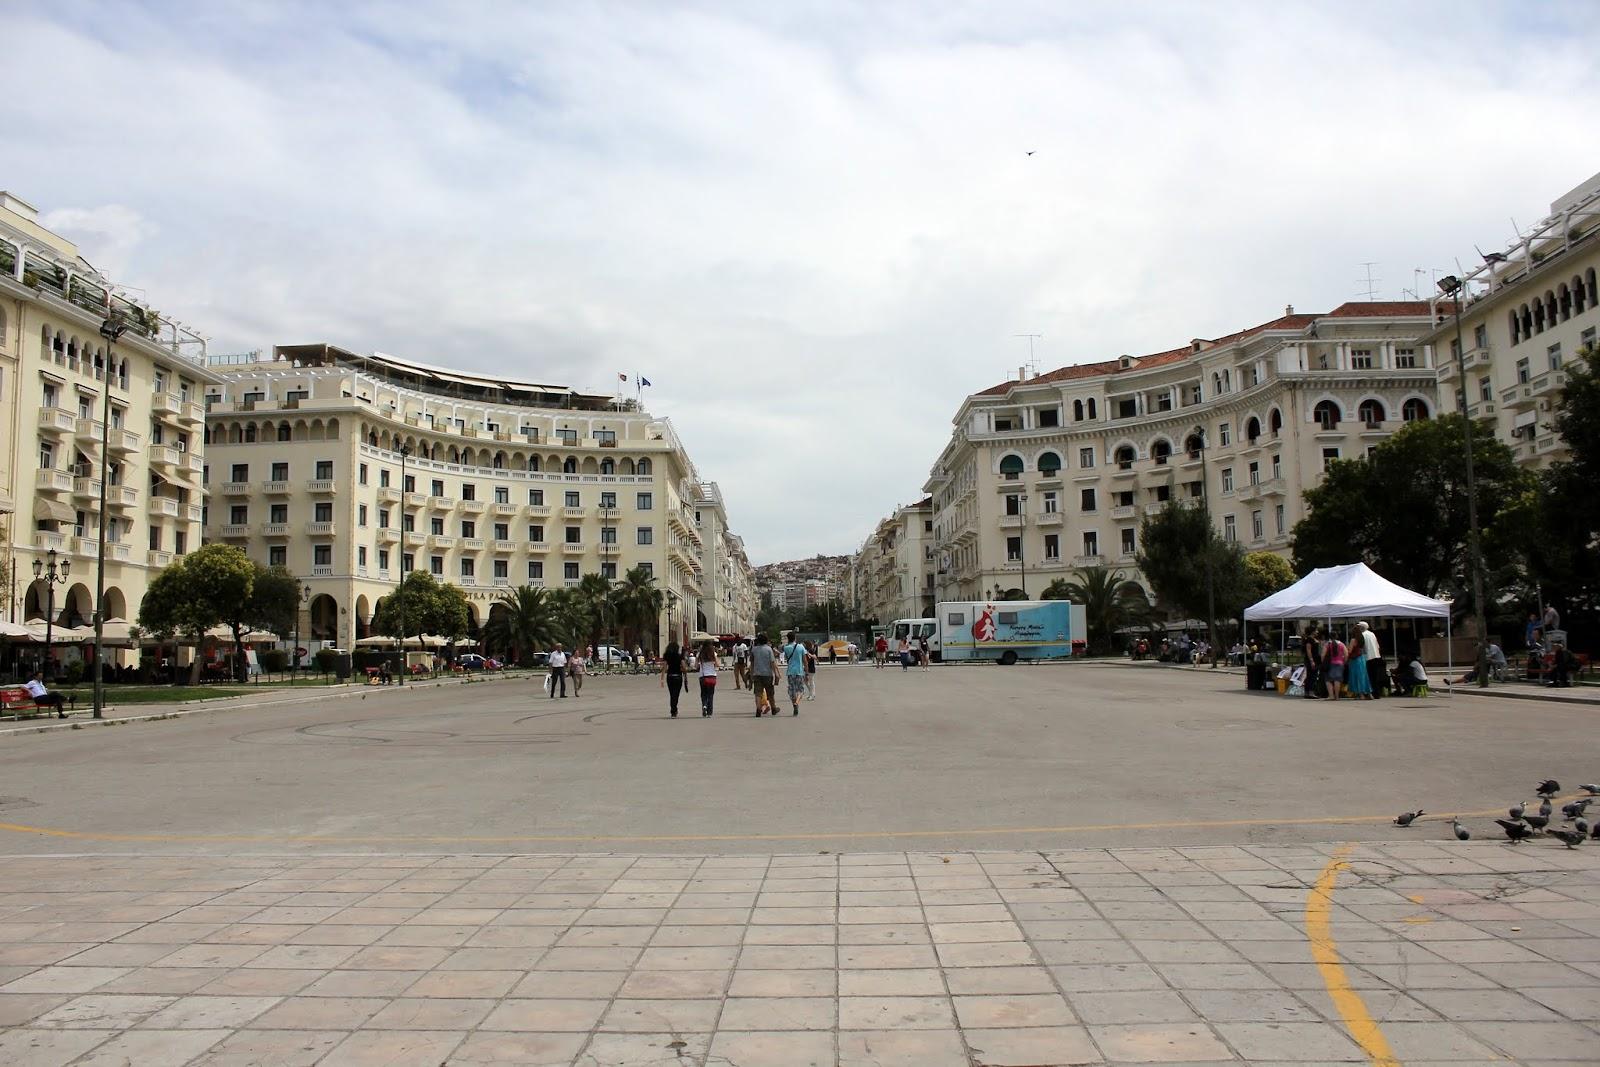 Day 19 - 2013-06-12 - Thessaloniki - IMG_0272.JPG